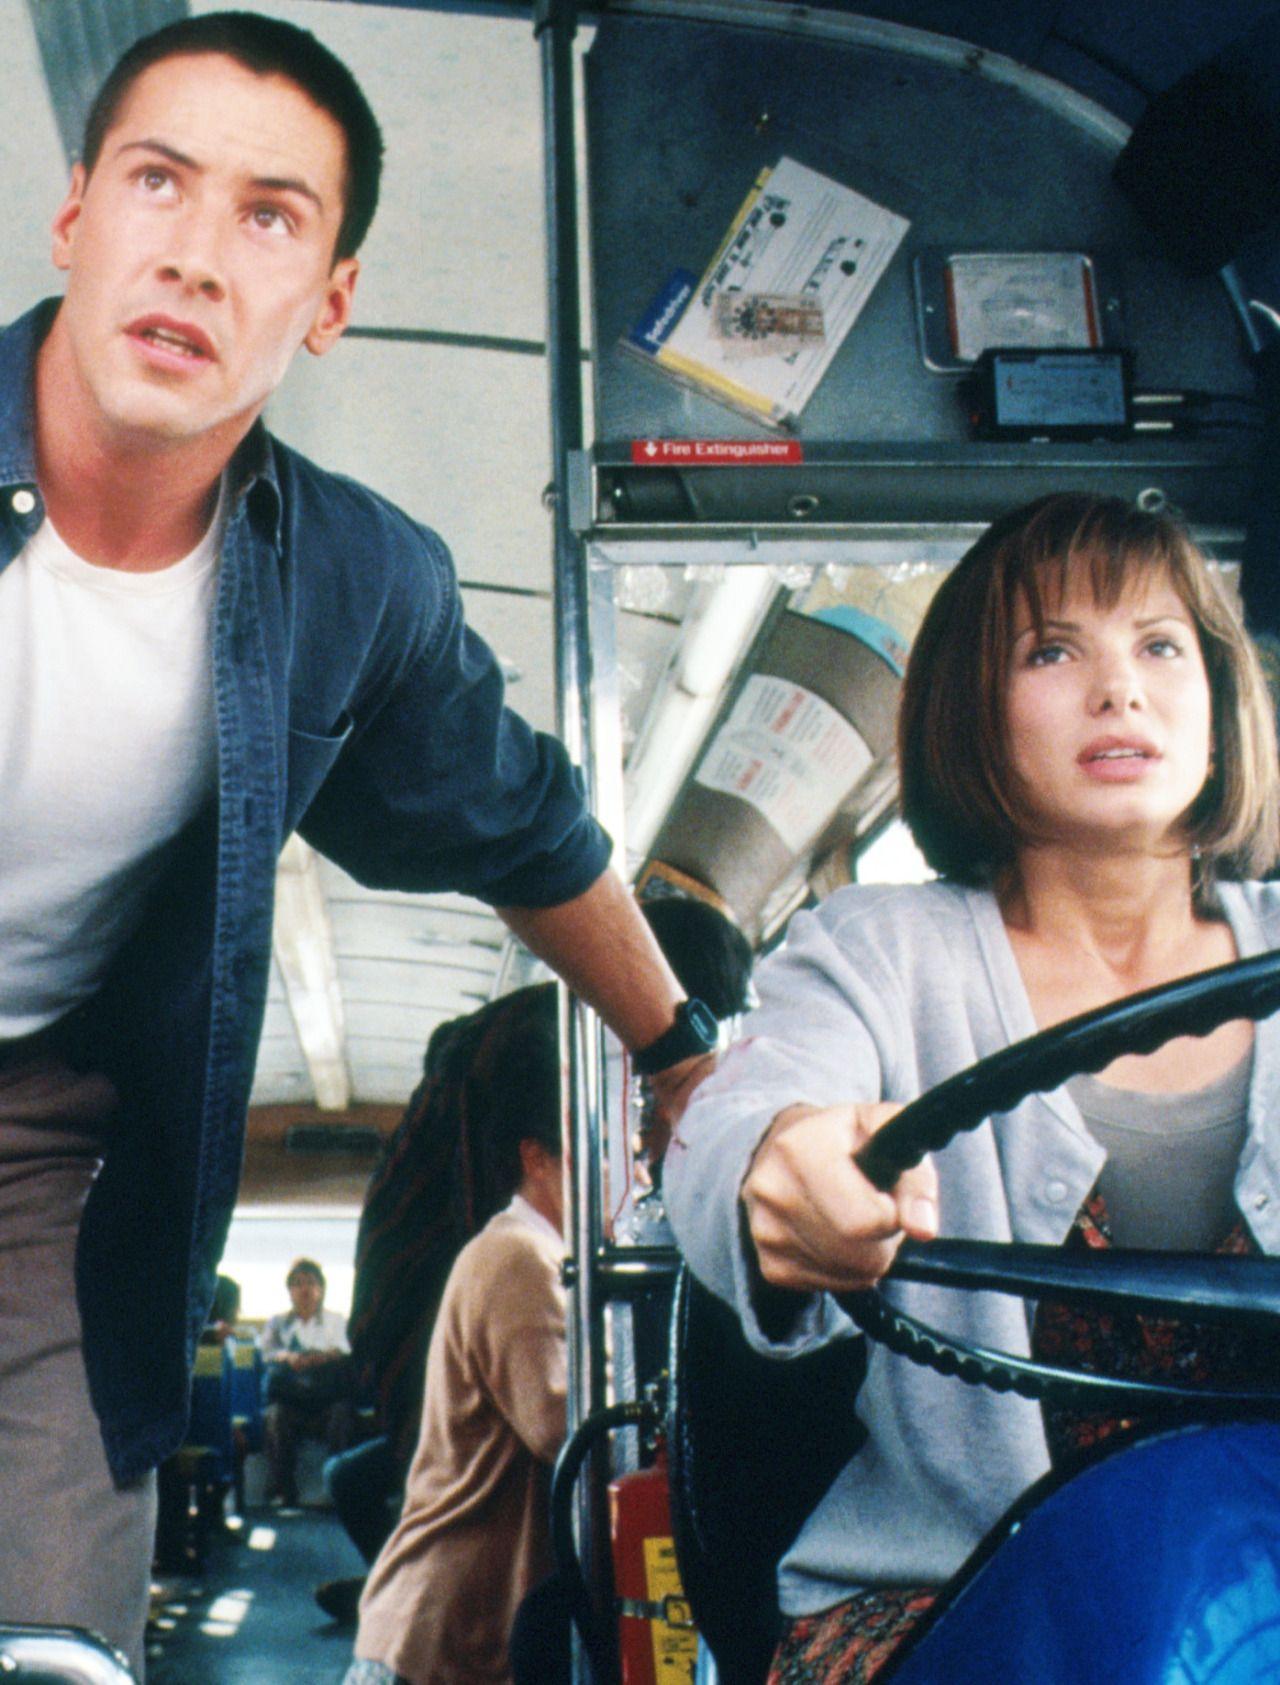 Keanu Reeves and Sandra Bullock in Speed, 1994. Via http